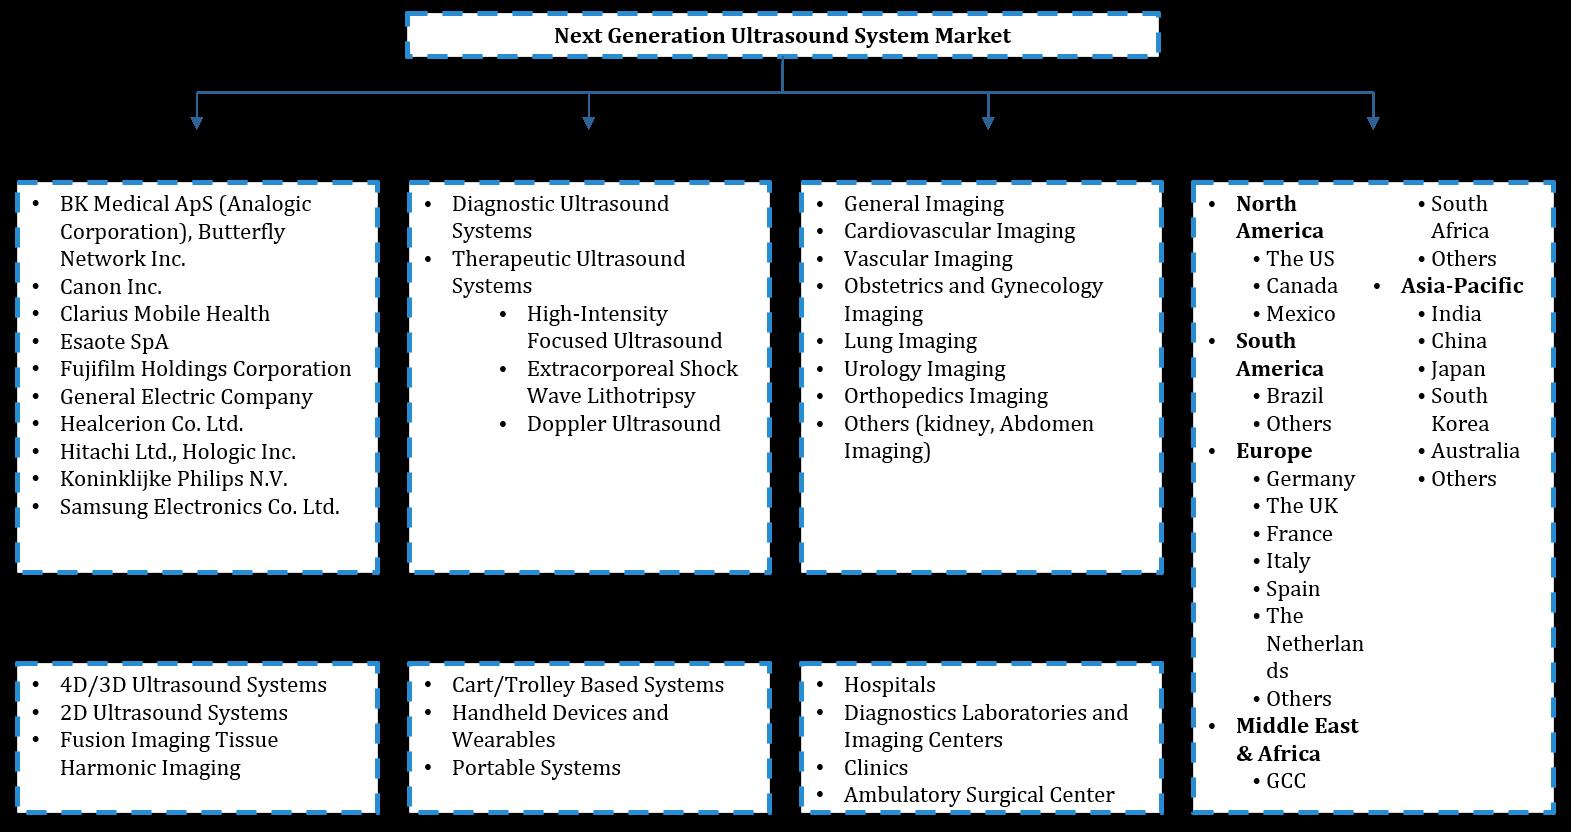 Global Next-Generation Ultrasound System Market Segmentation